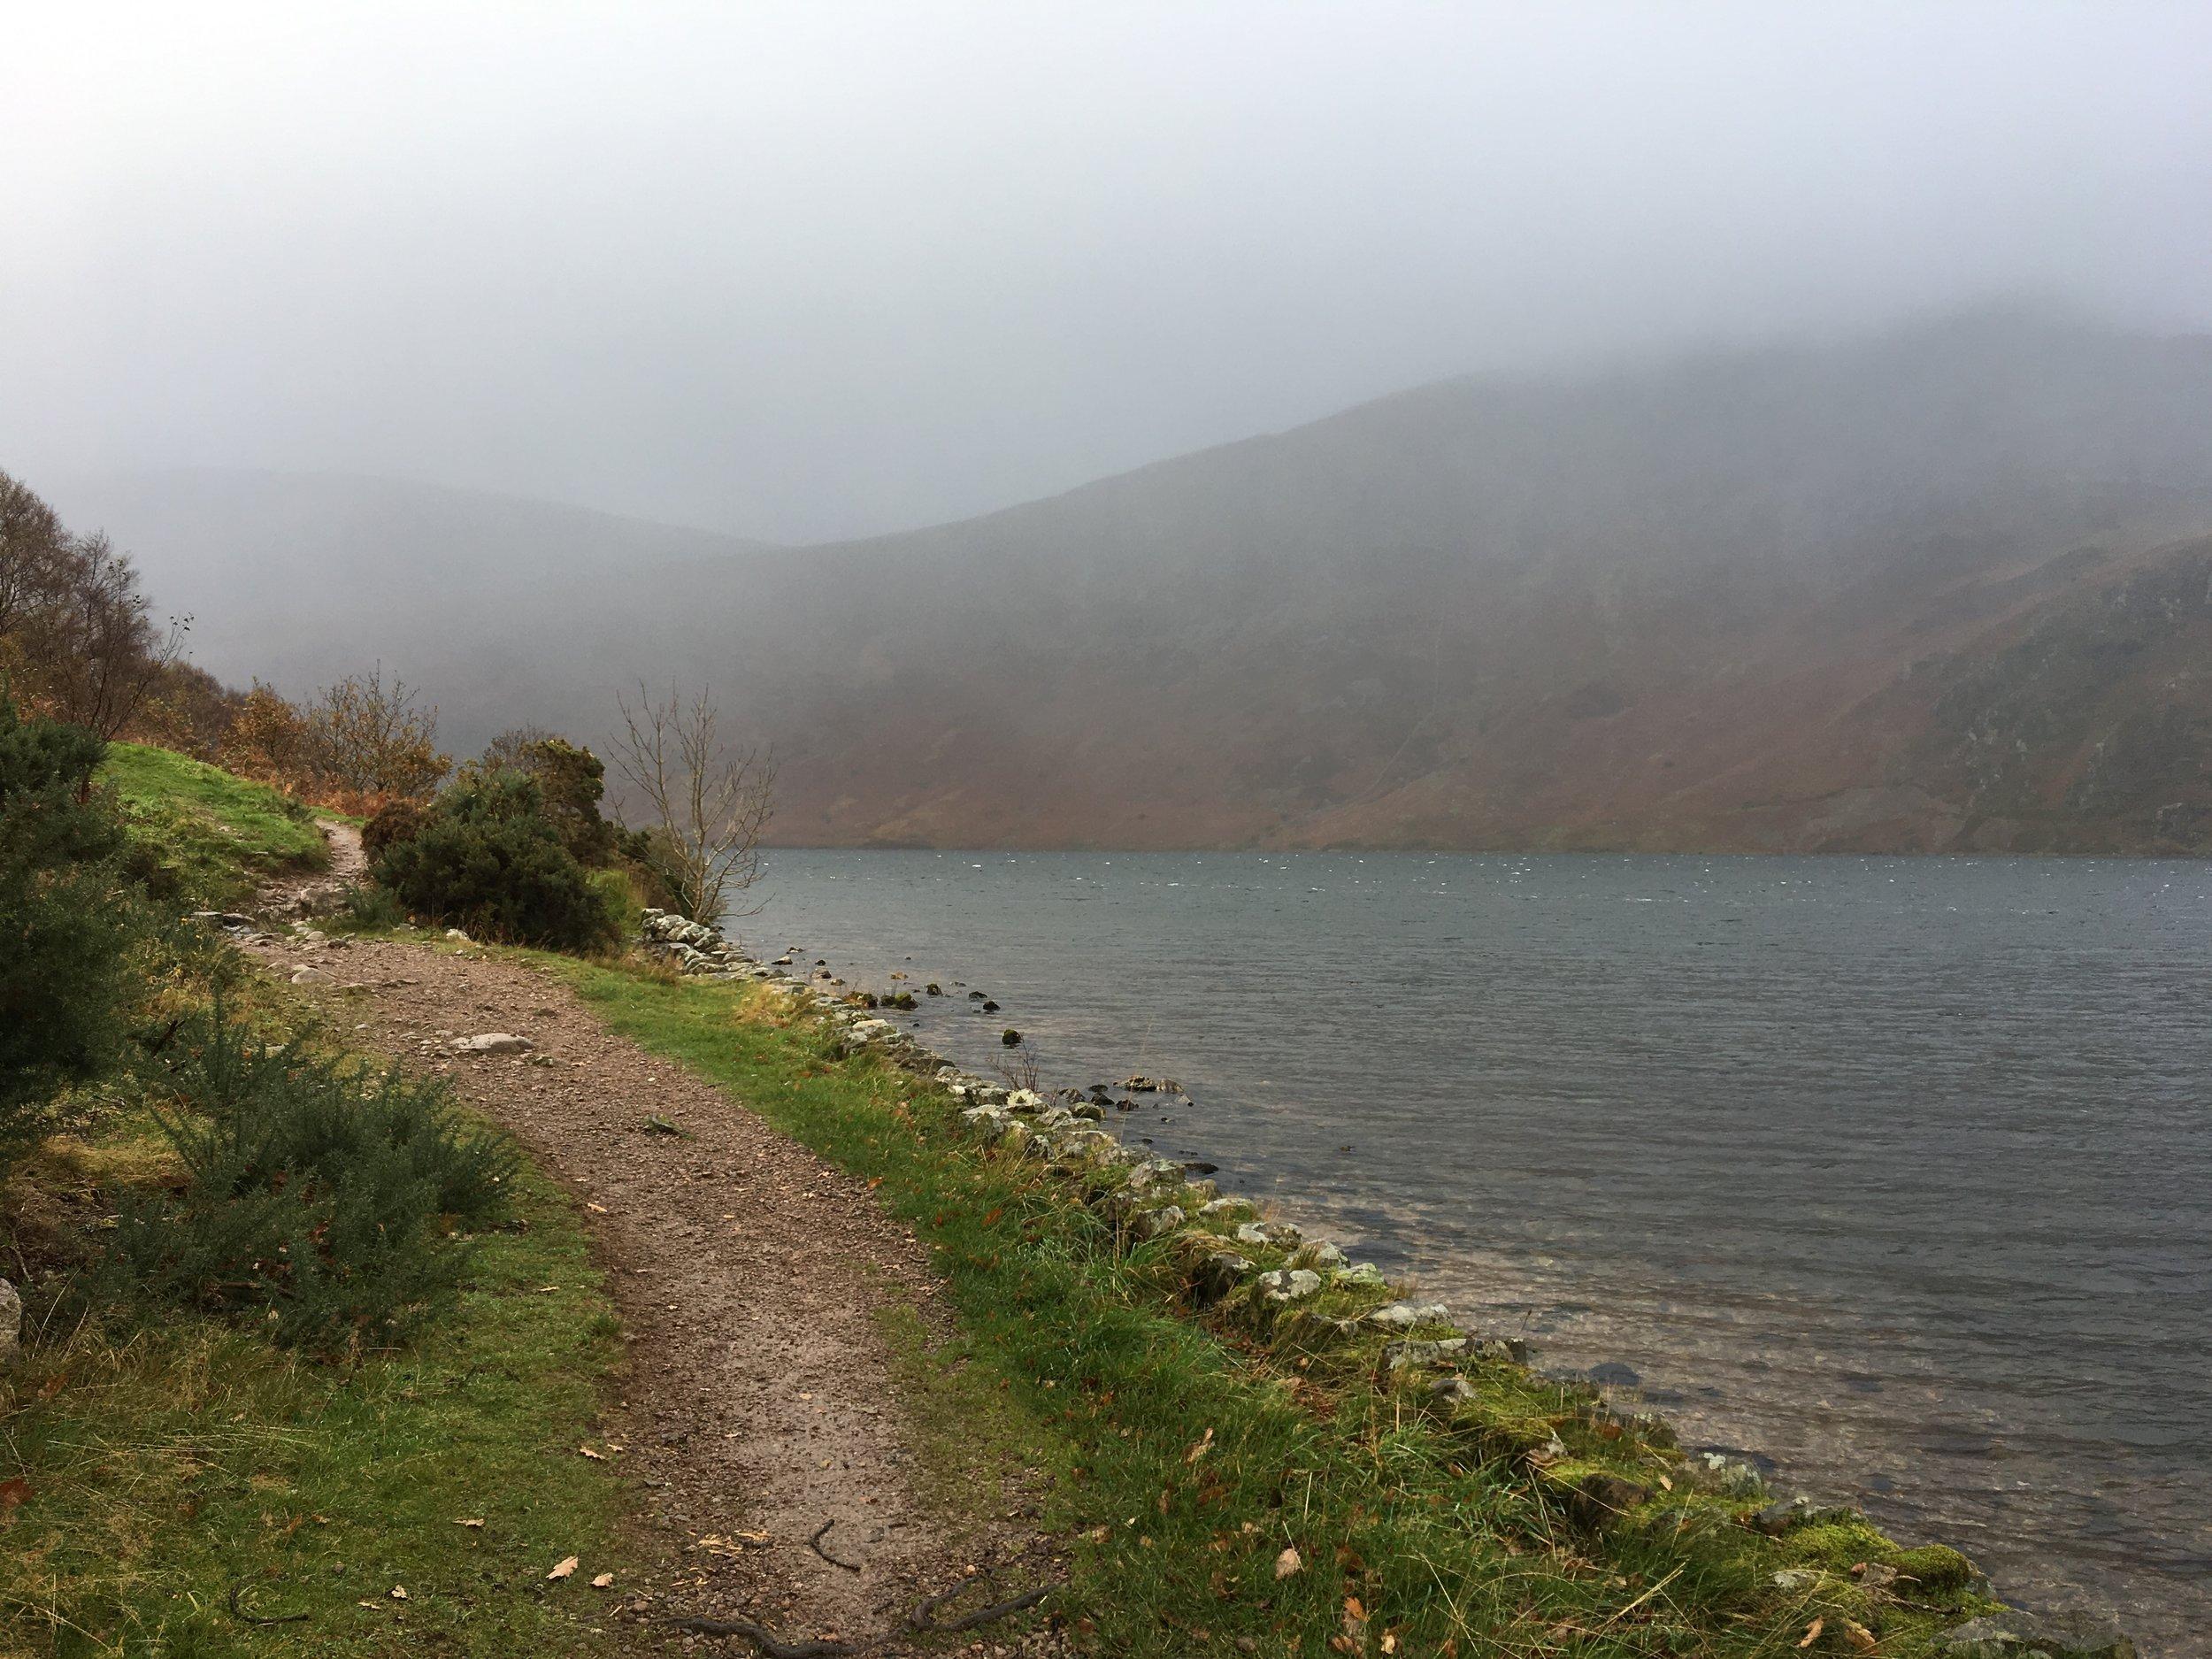 Ennerdale Water, Lake District, England